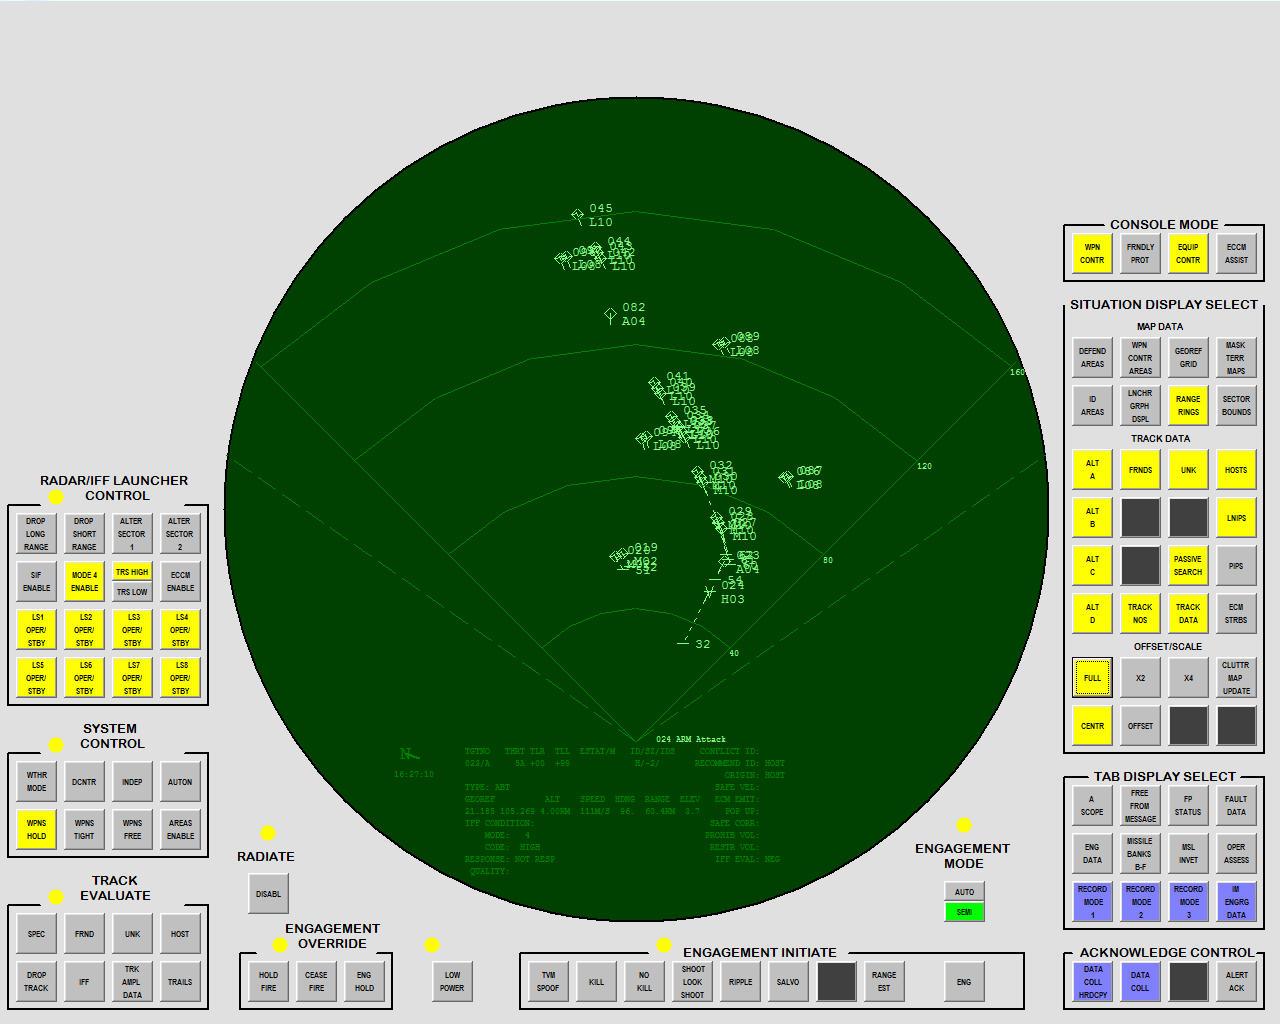 S 300 missile systems vs patriot - S 300 Missile Systems Vs Patriot 54